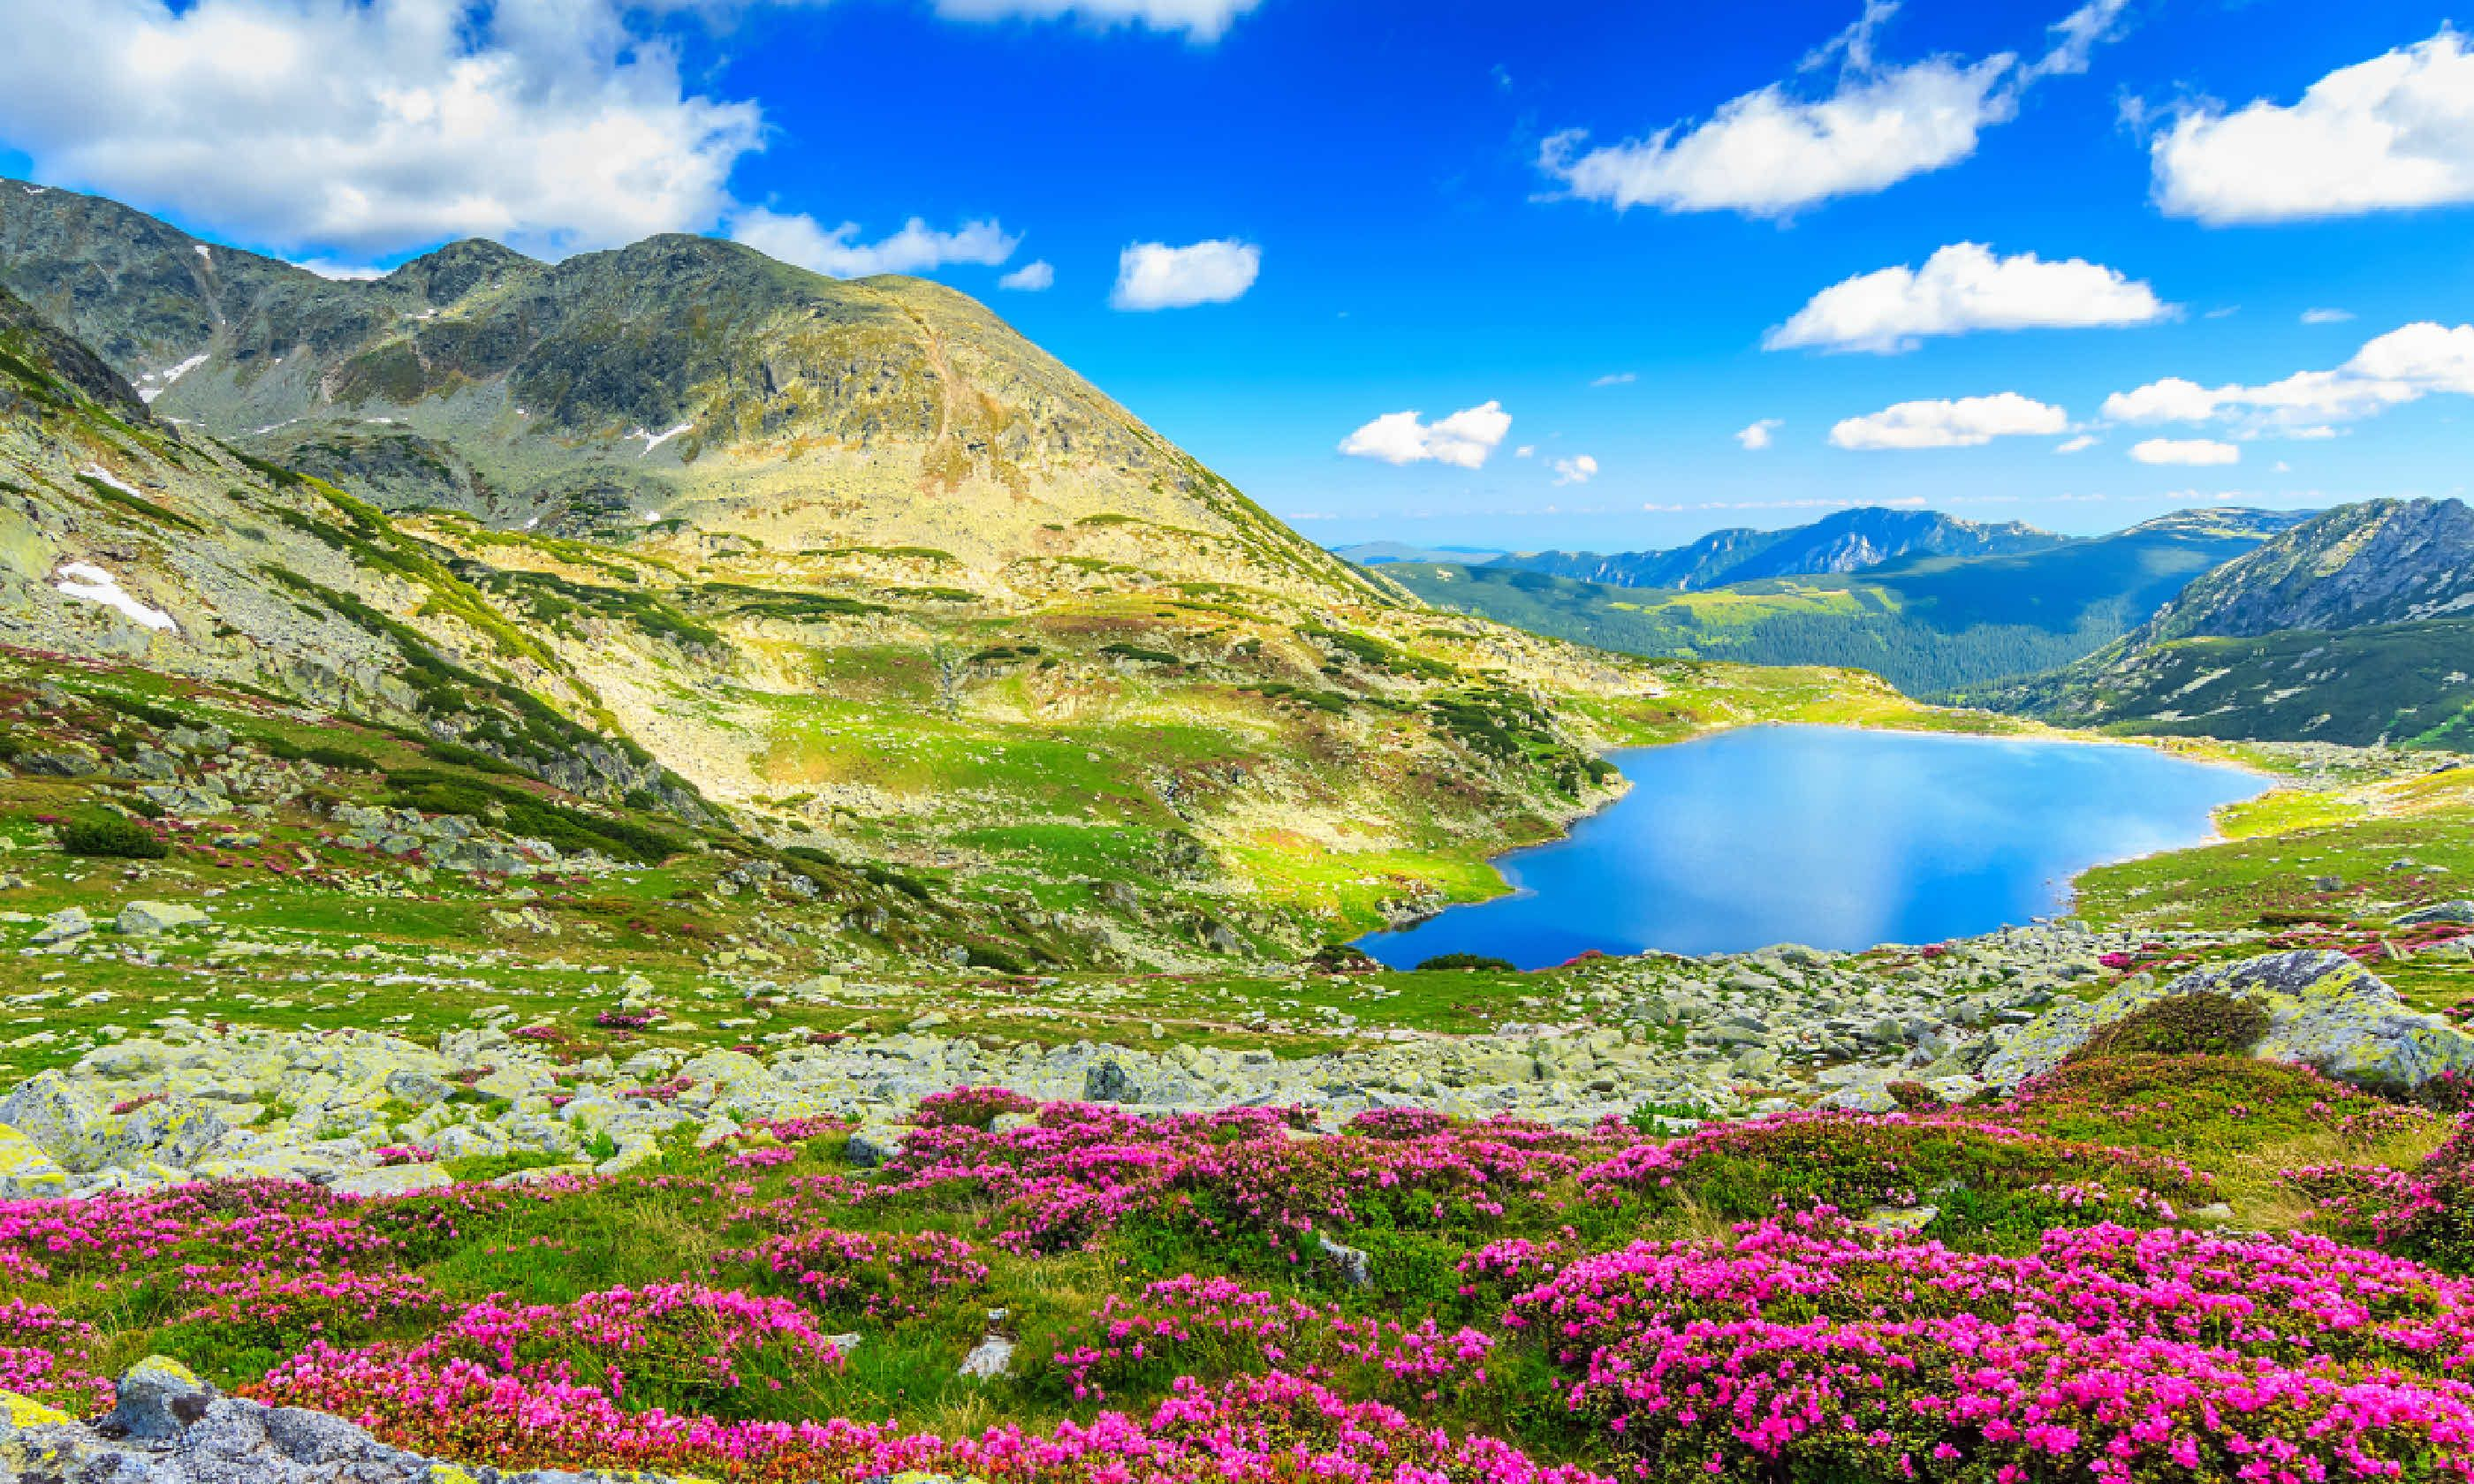 Carpathians, Romania (Shutterstock)